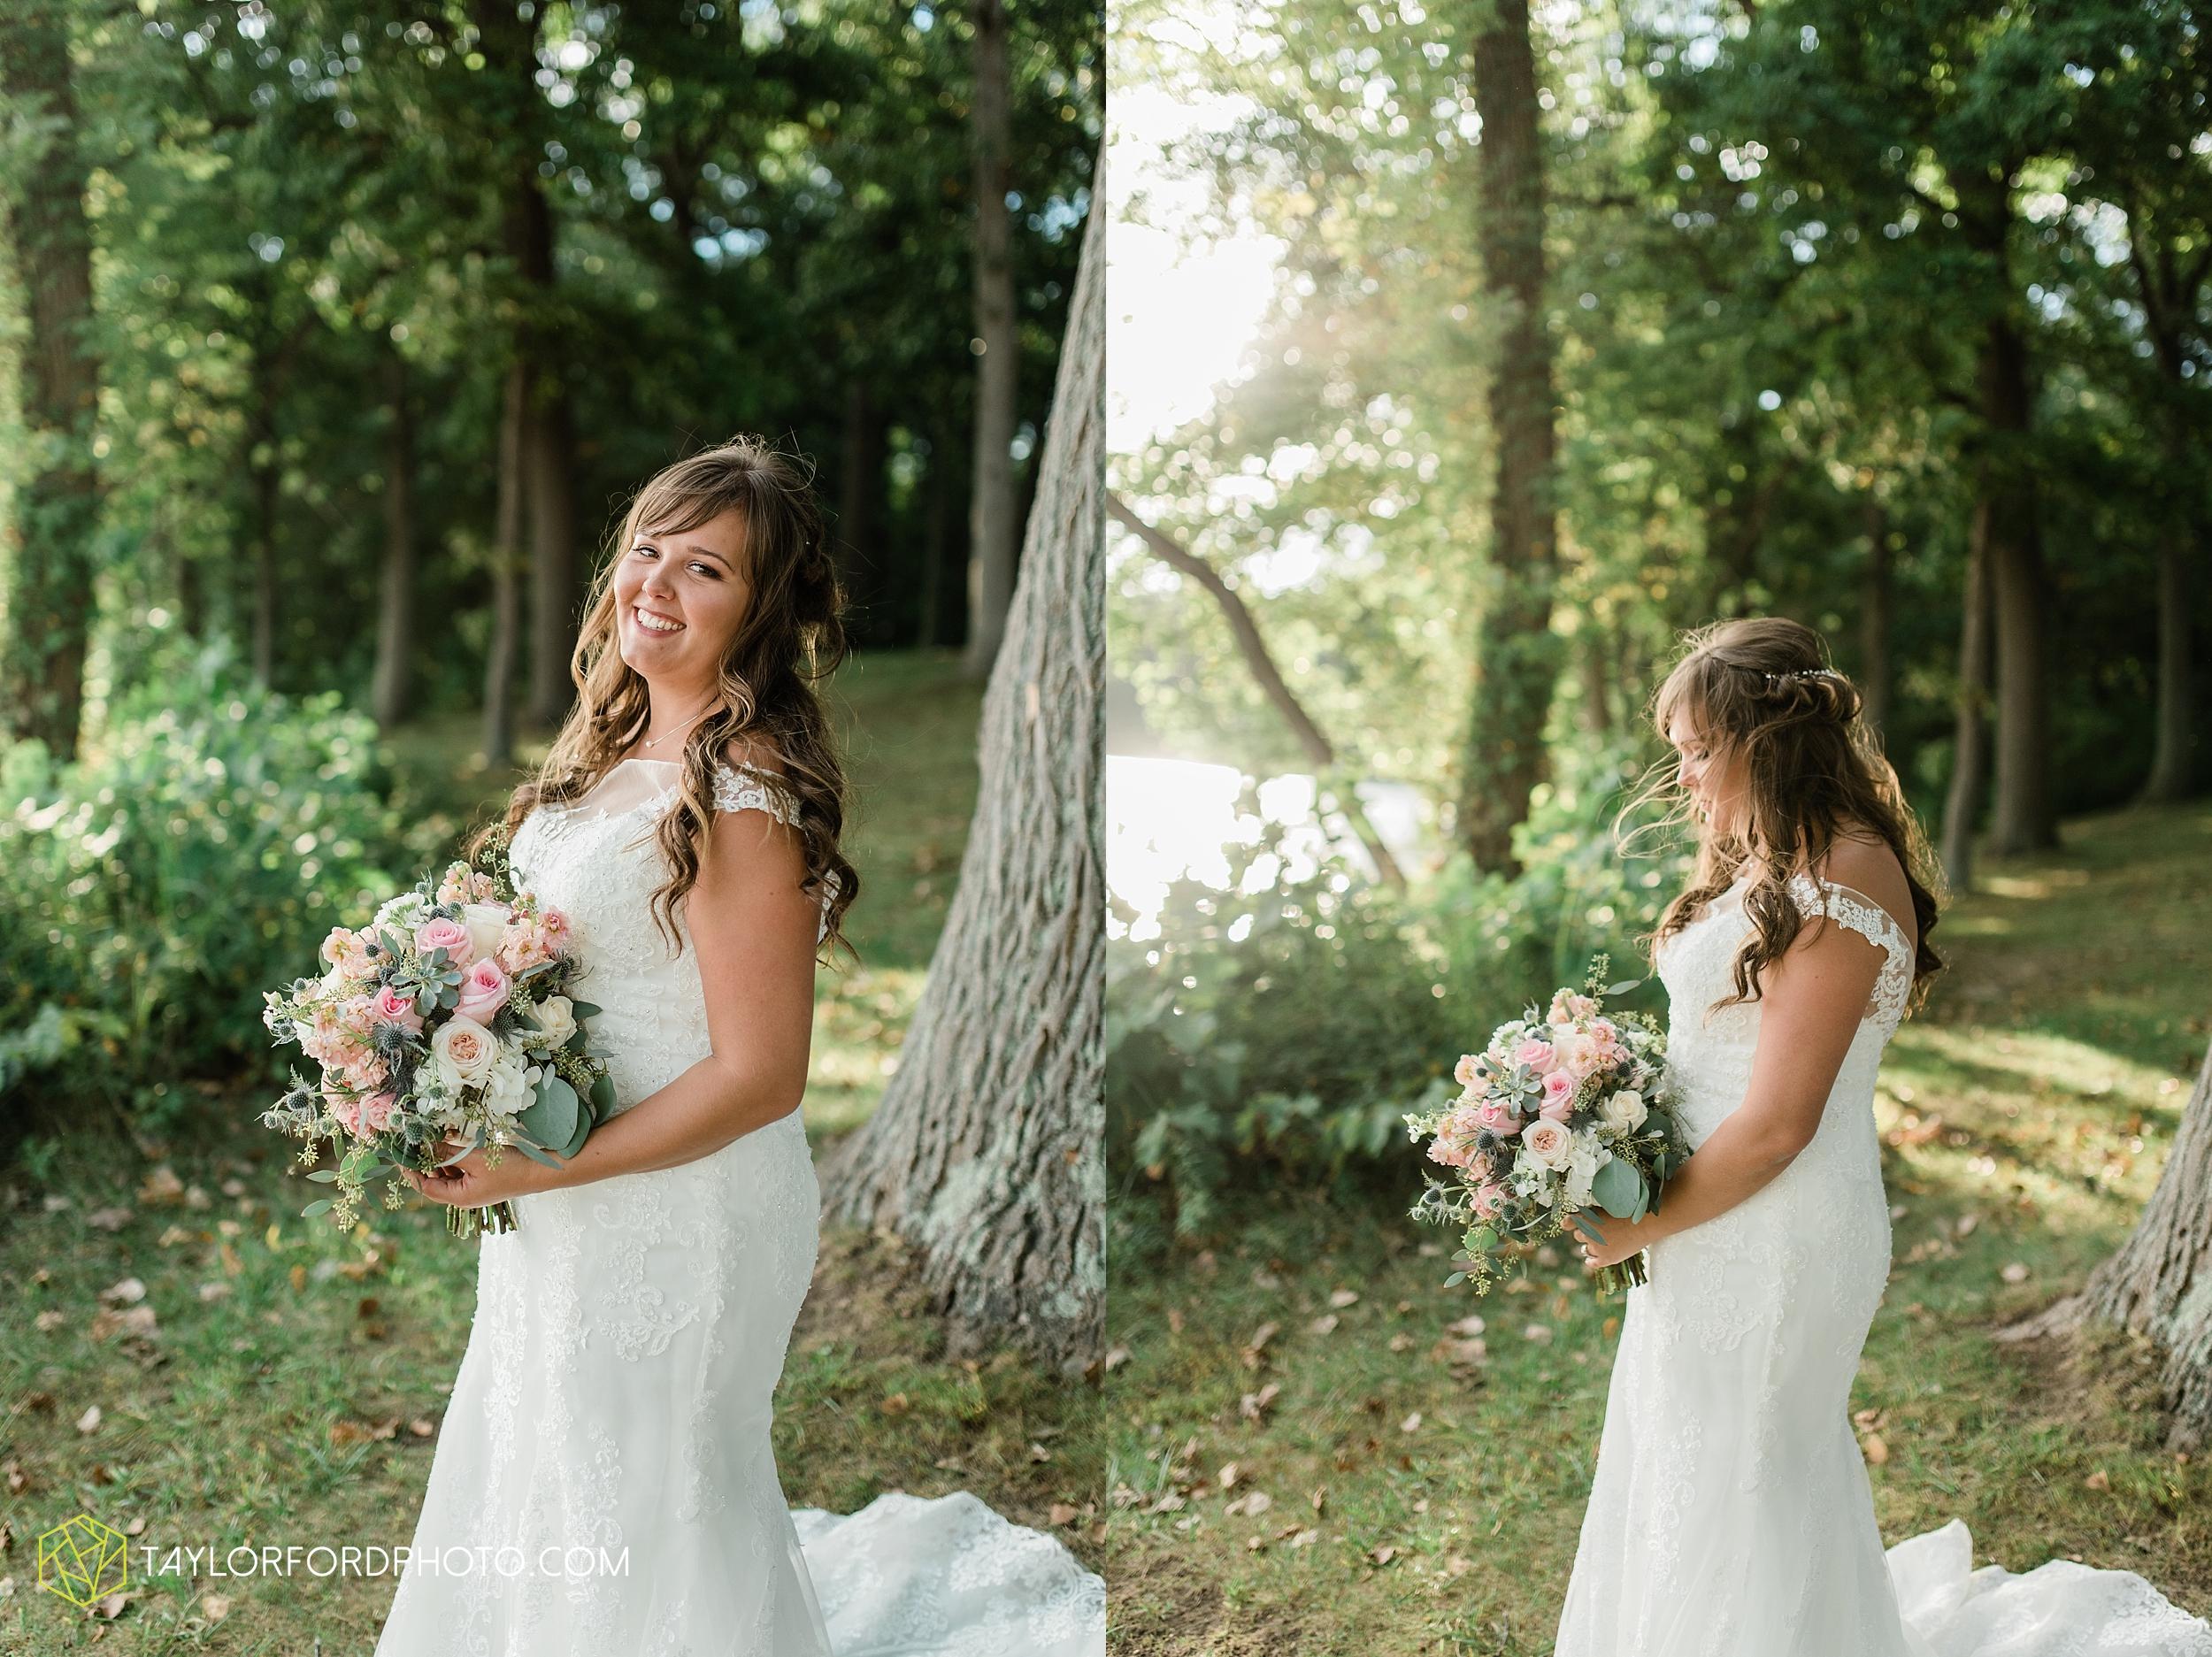 brook-loren-pokagon-state-park-angola-indiana-potowatomi-inn-wedding-fall-lake-james-photographer-taylor-ford-photography_0538.jpg